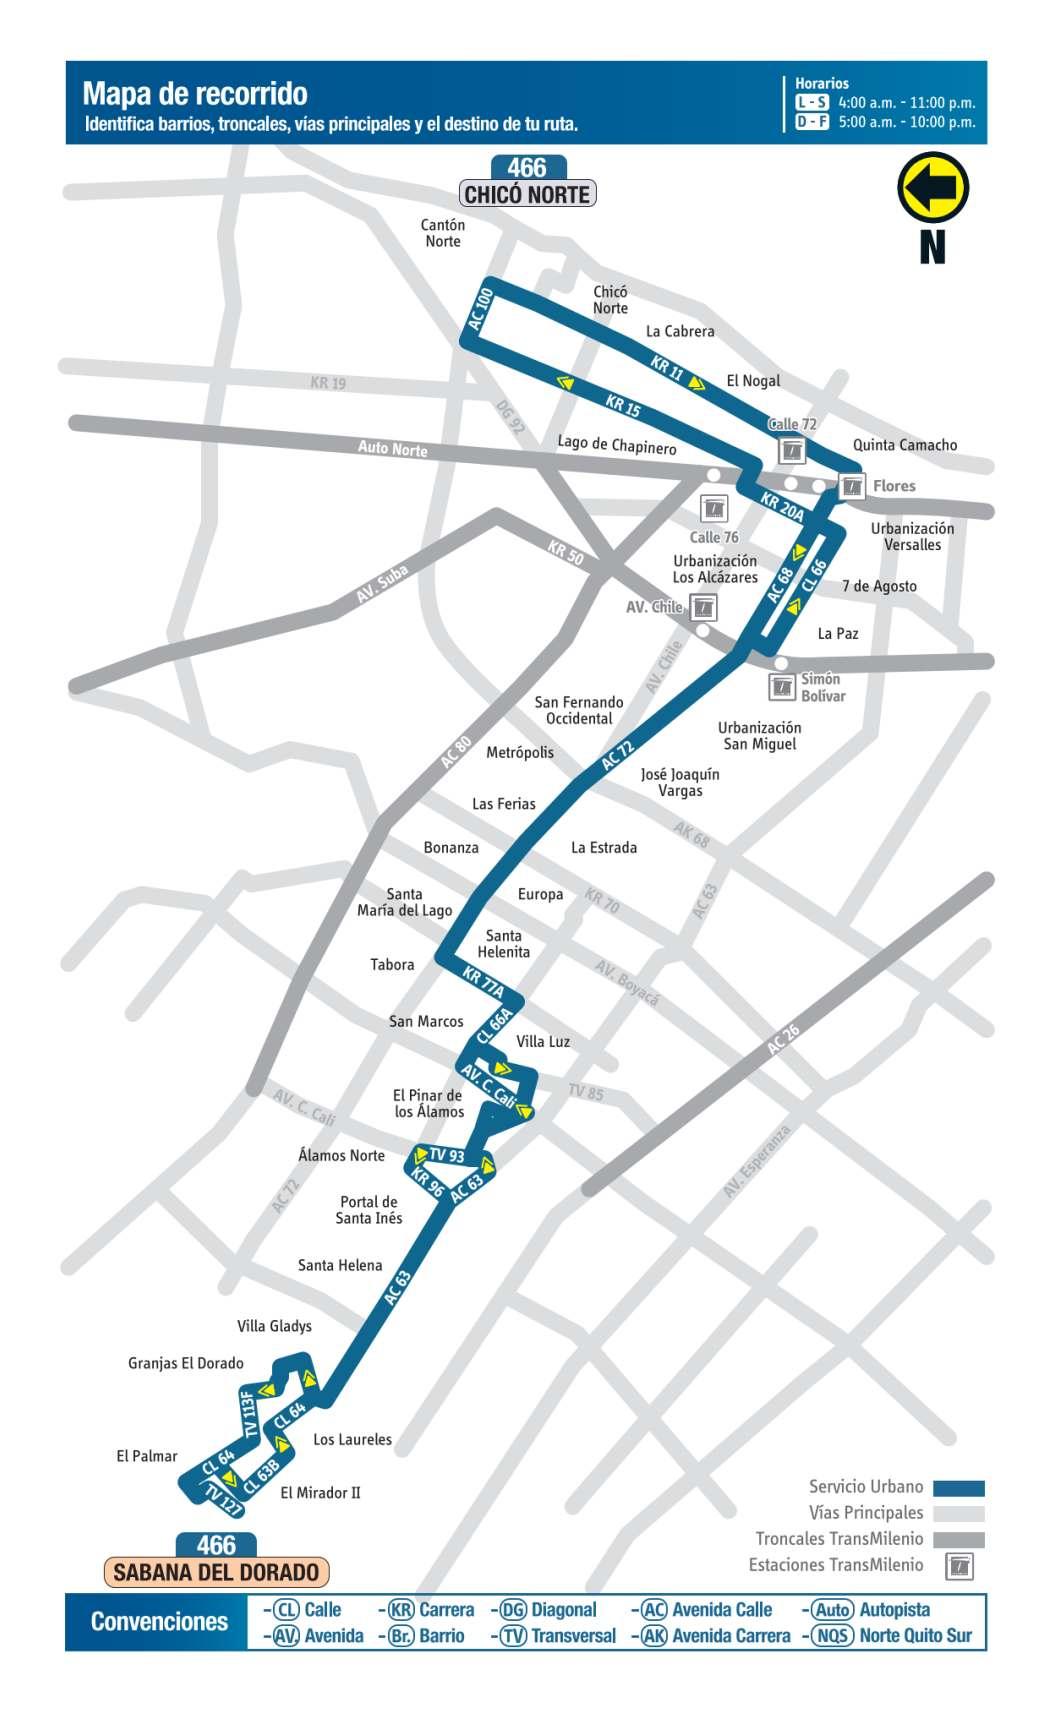 466 Sabana del Dorado - Chicó Norte, mapa bus urbano Bogotá